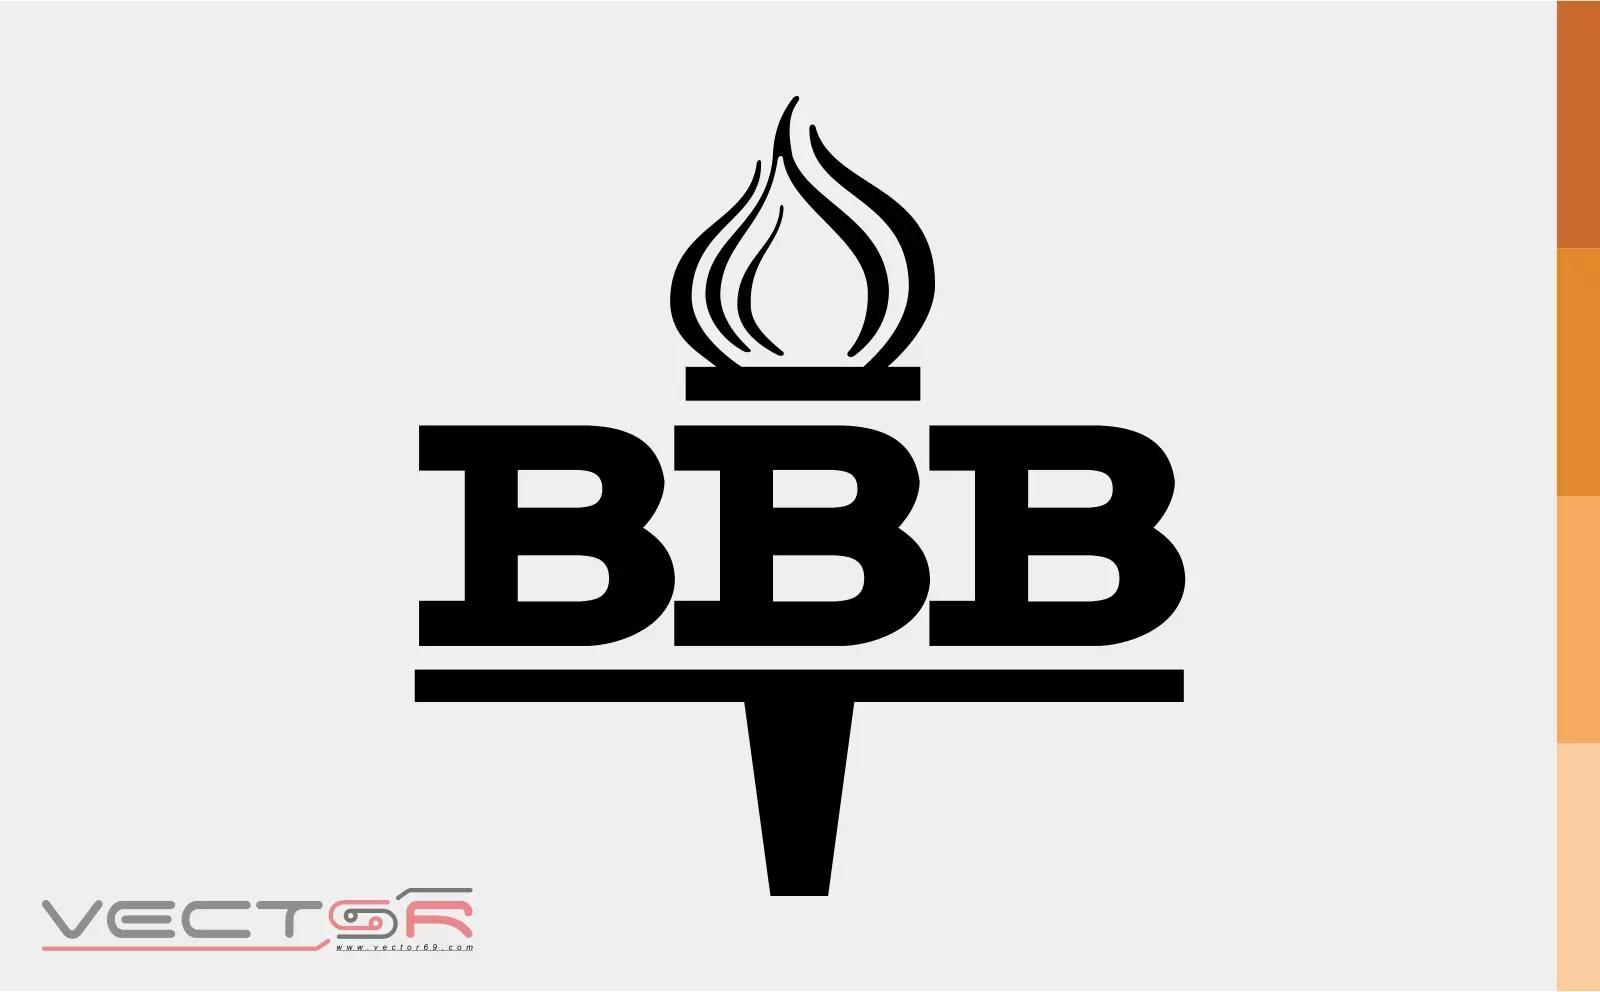 BBB - Better Business Bureau (1965) Logo - Download Vector File AI (Adobe Illustrator)